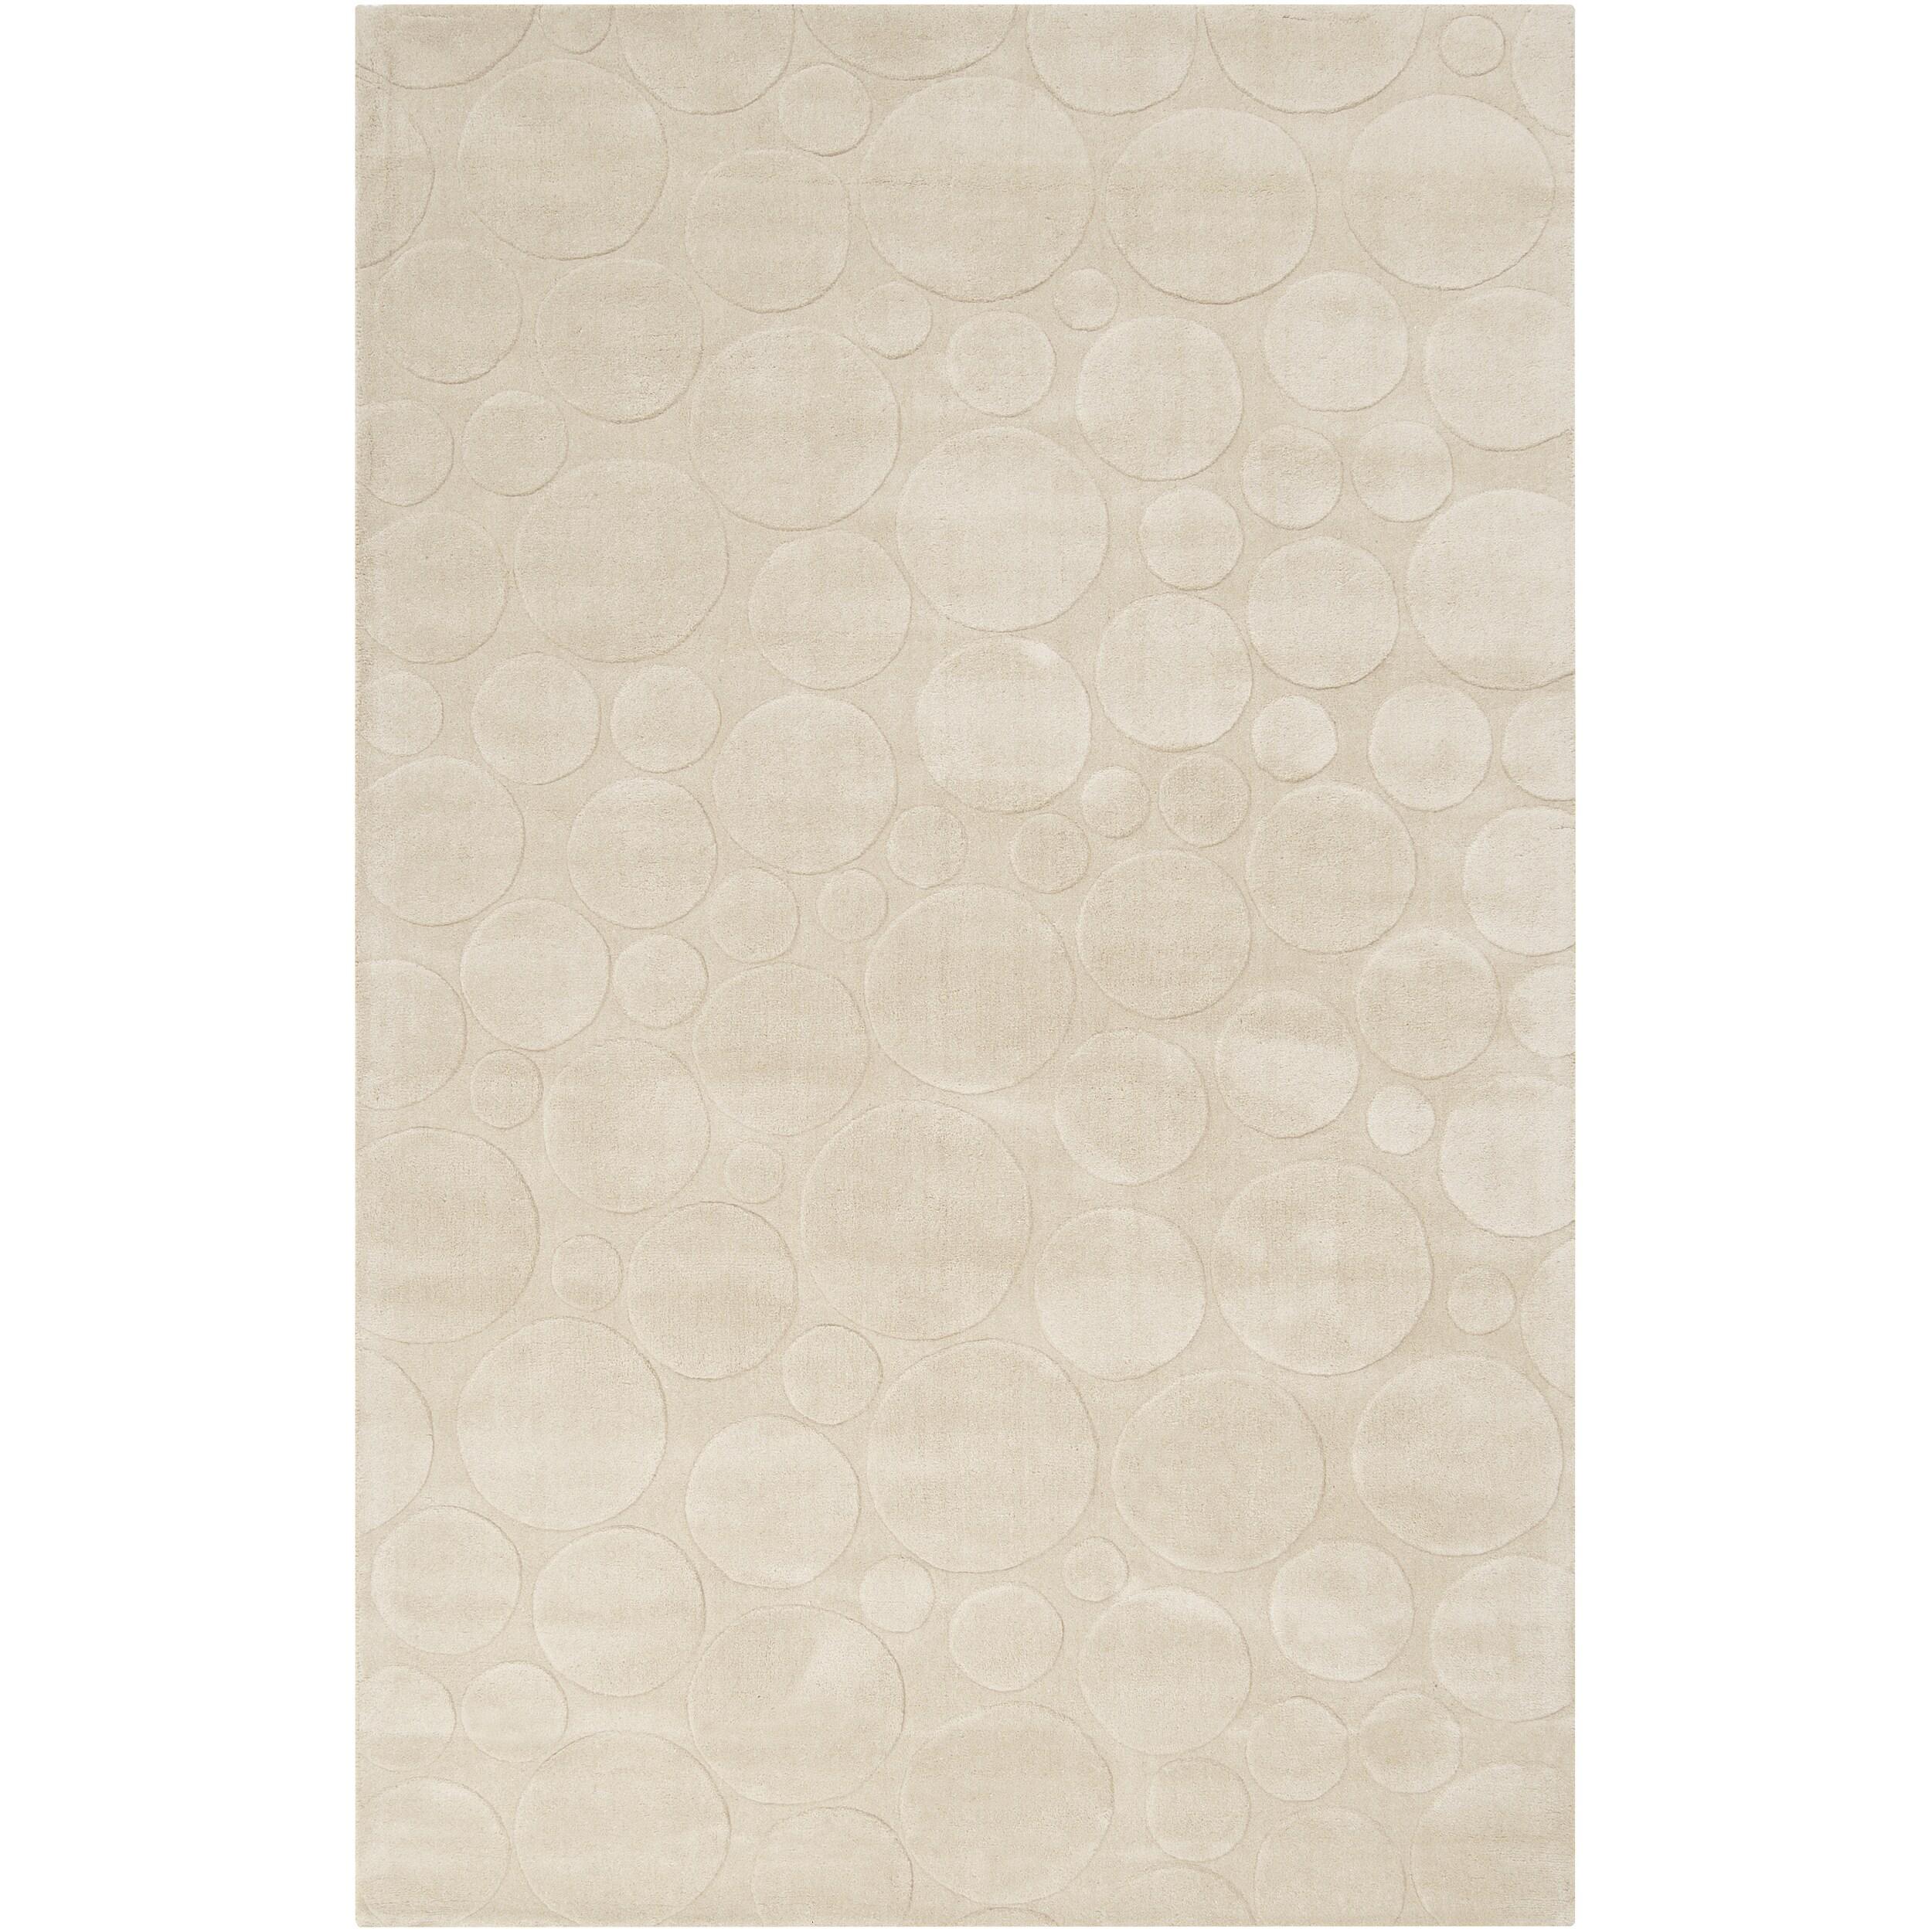 Candice Olson Loomed Cream Scuddle Geometric Circles Wool Rug (9' x 13')